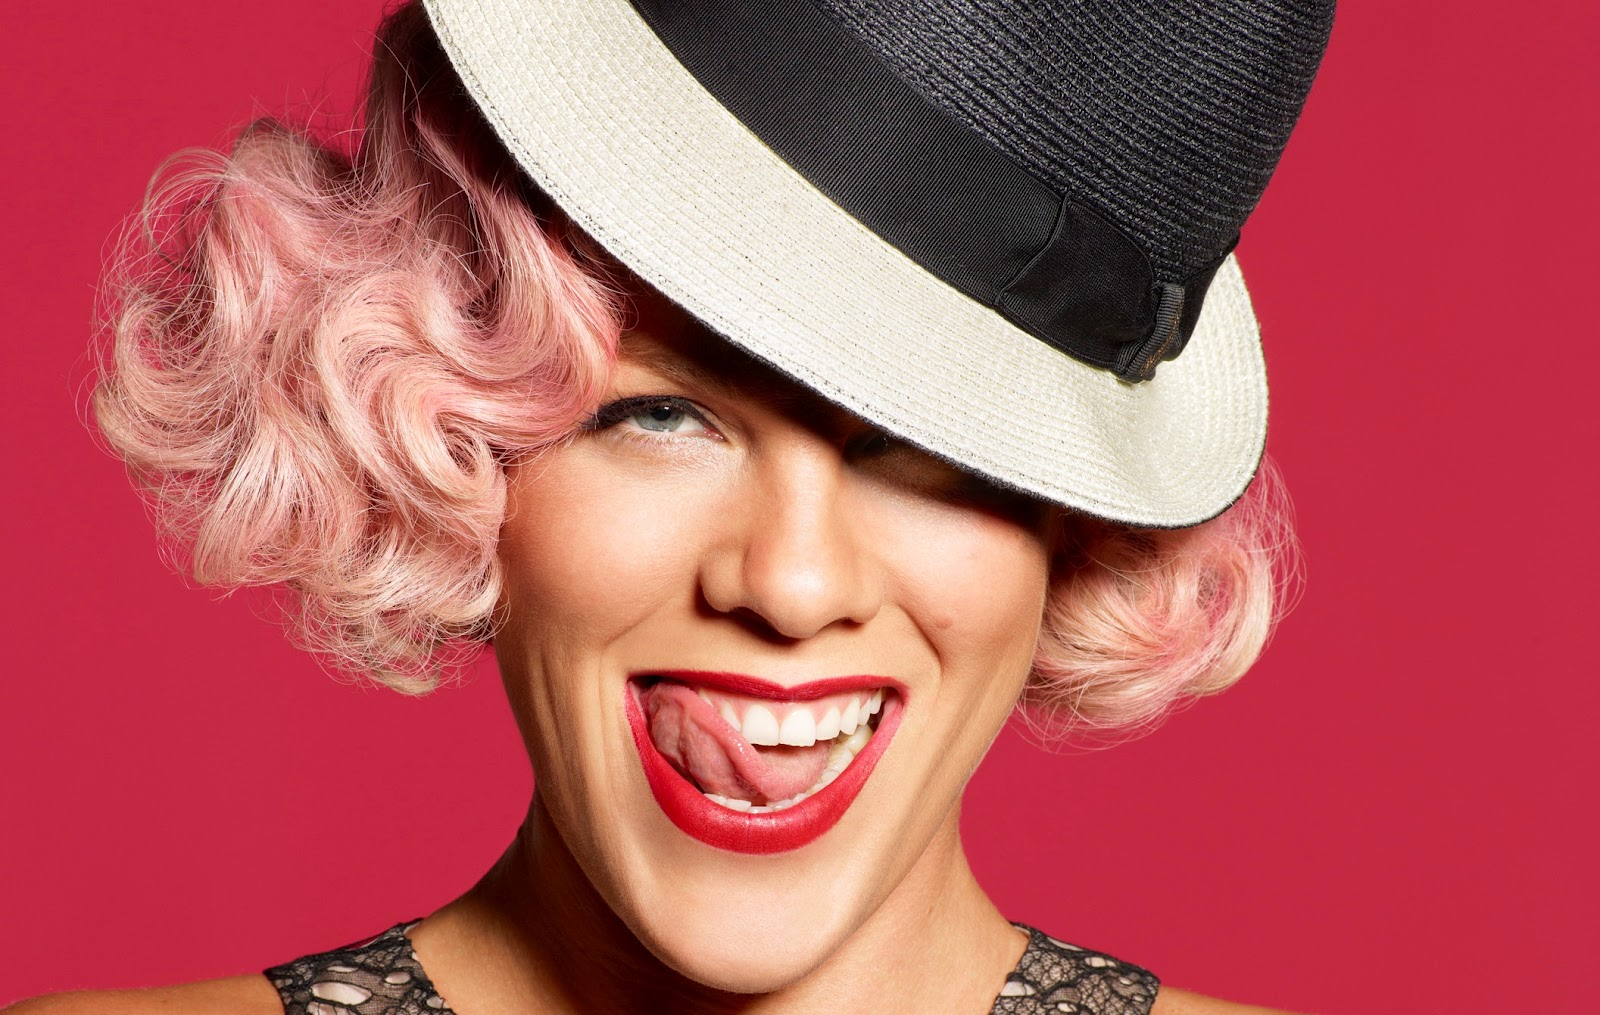 http://2.bp.blogspot.com/-AFE2Xyp9-ME/UE6E5PIchkI/AAAAAAAAGOA/bSHR03jUq-U/s1600/pink-truth-love-promo.jpg